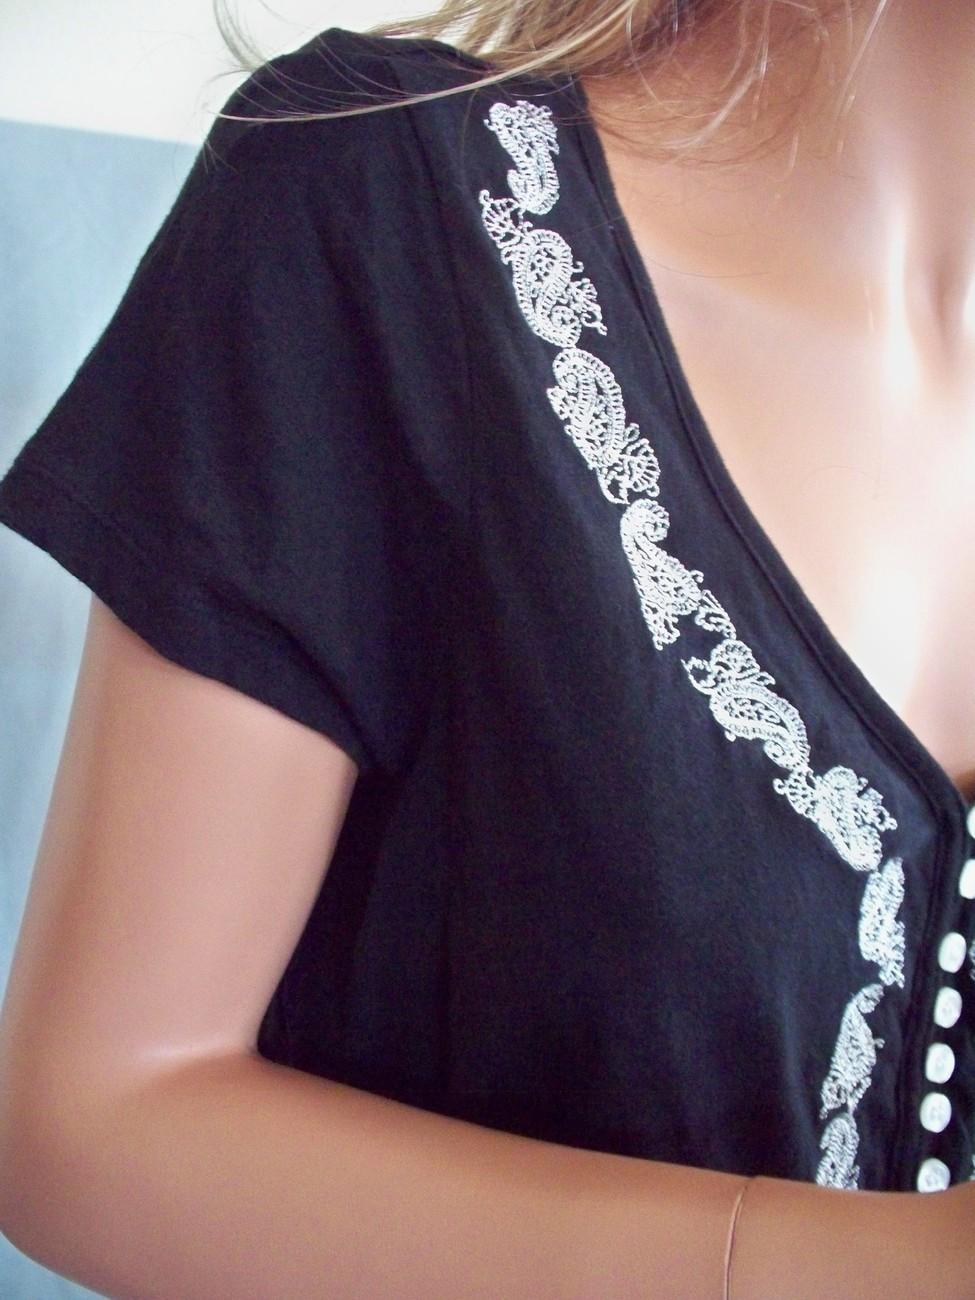 Medium M Bay Studio Black EMBELLISHED TEE SHIRT TOP PULLOVER BLOUSE Knit Tunic